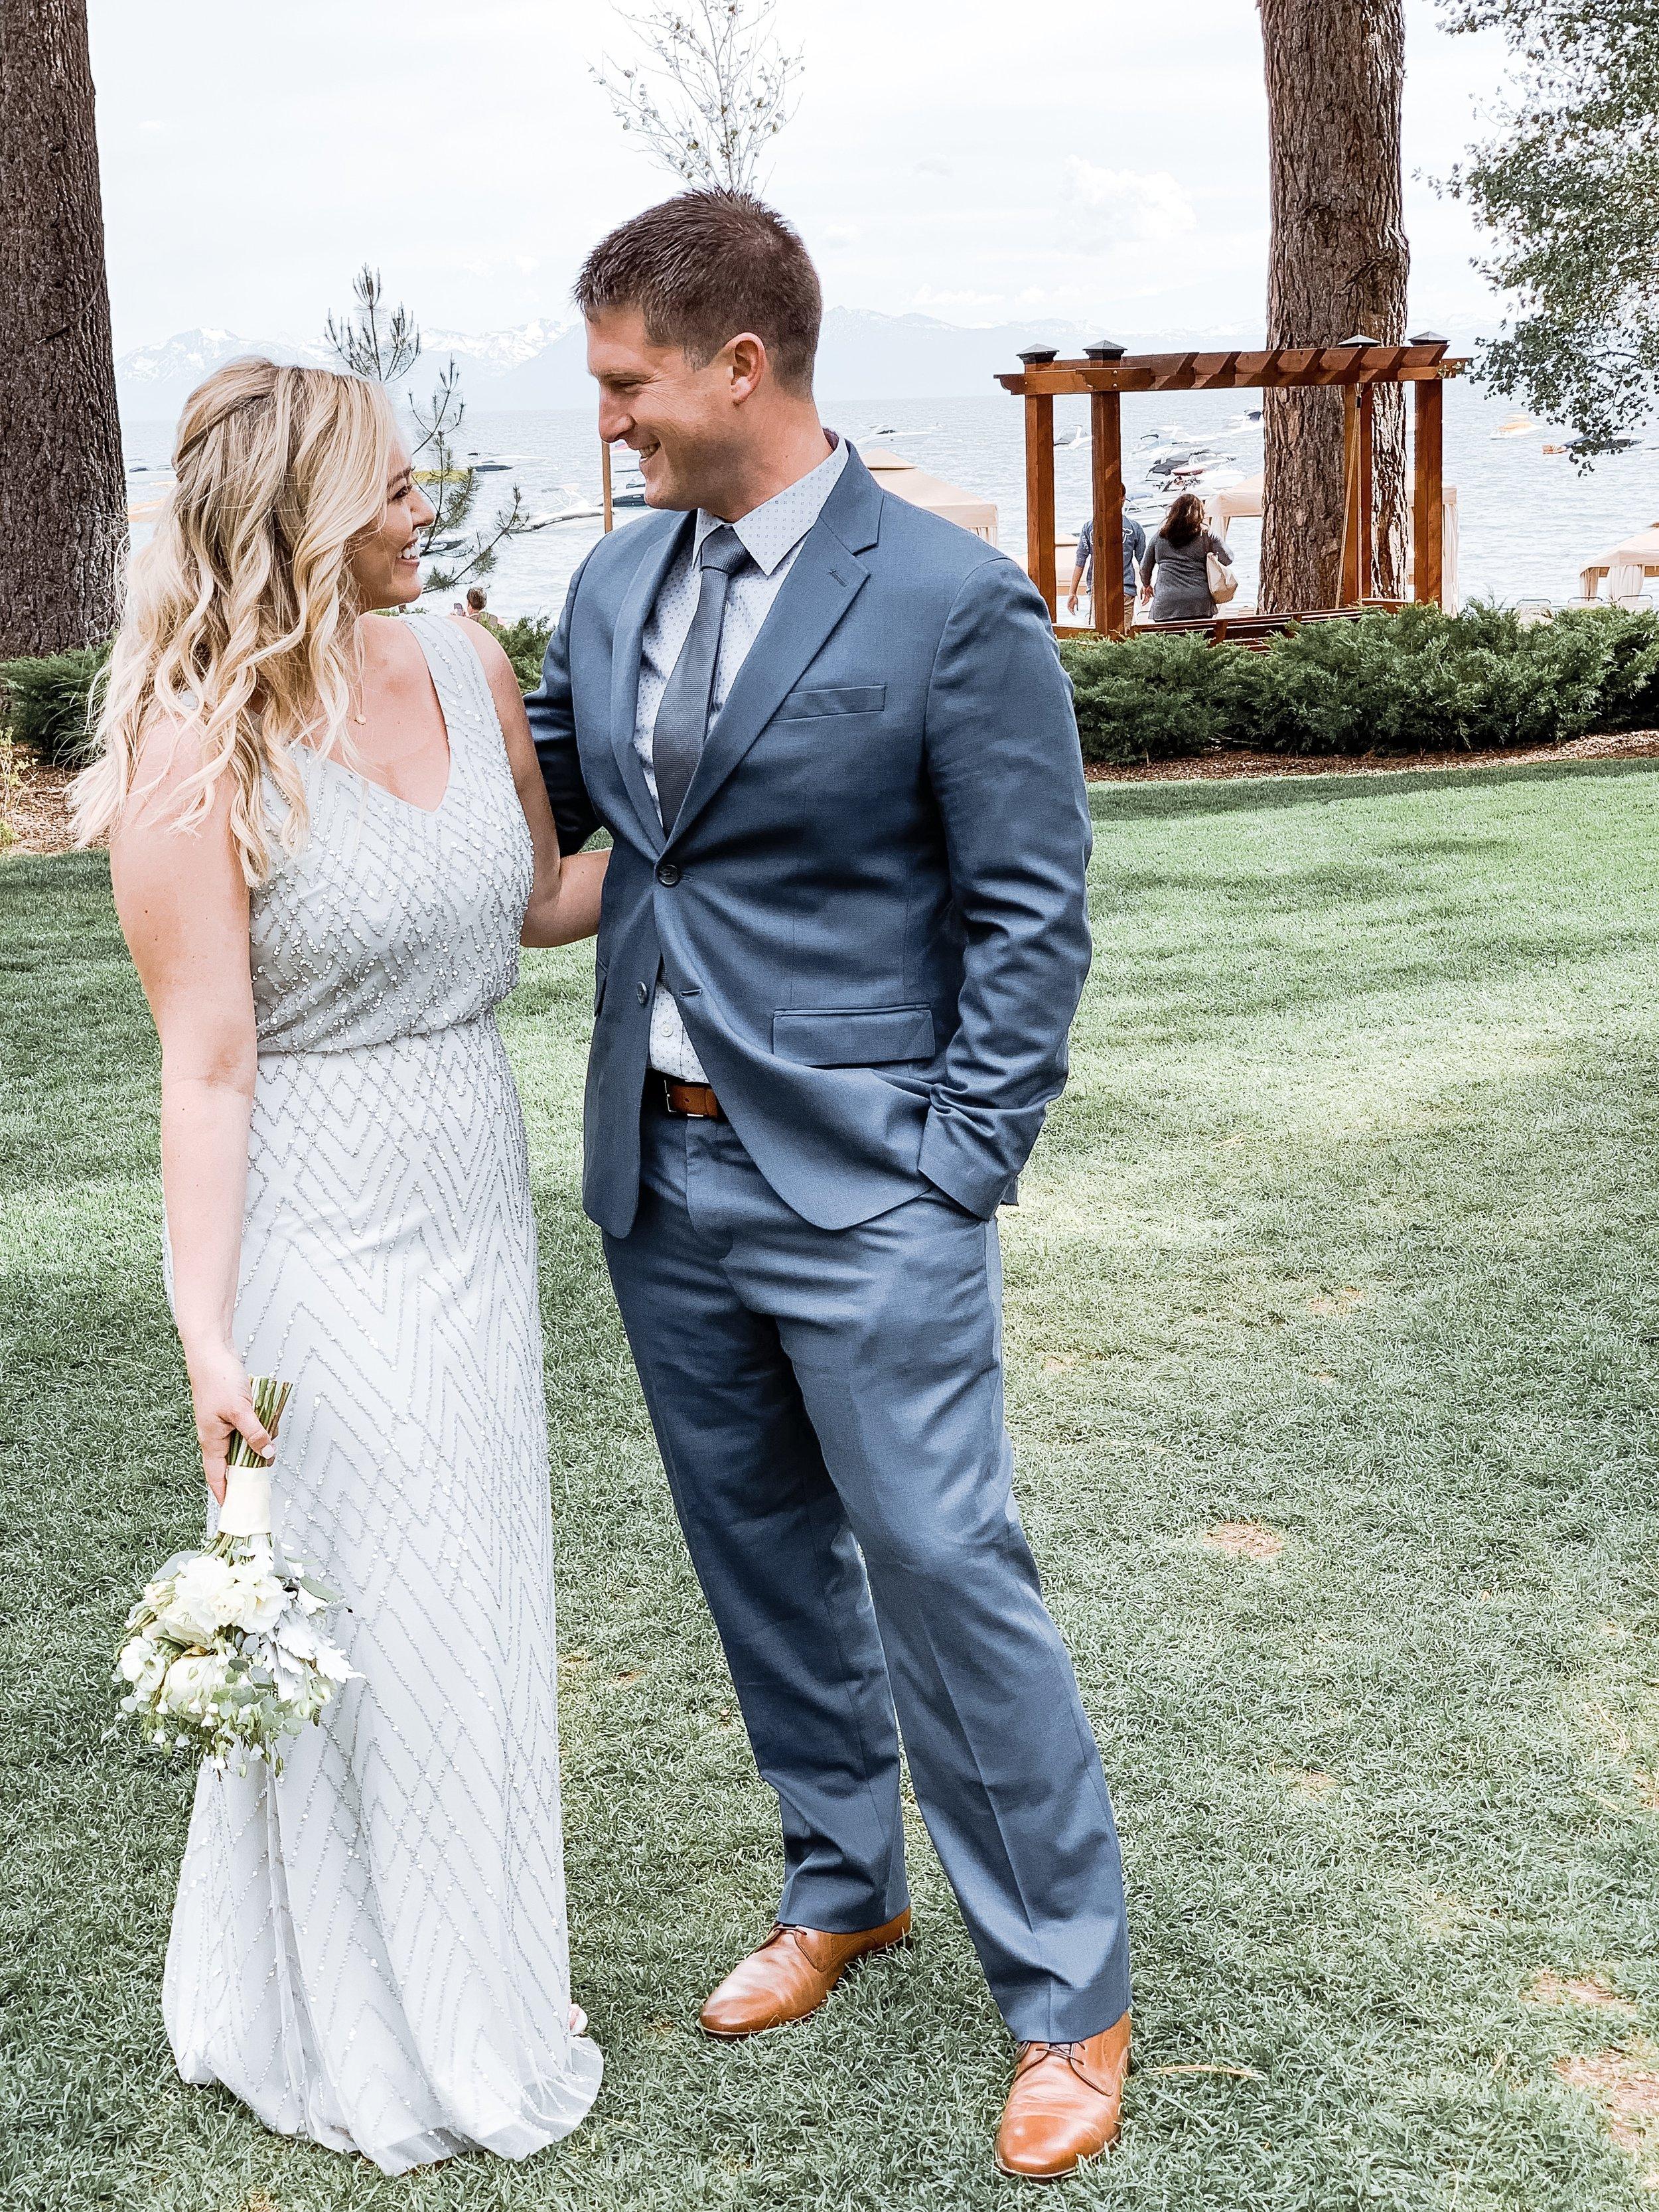 coolsculpting wedding results.JPG